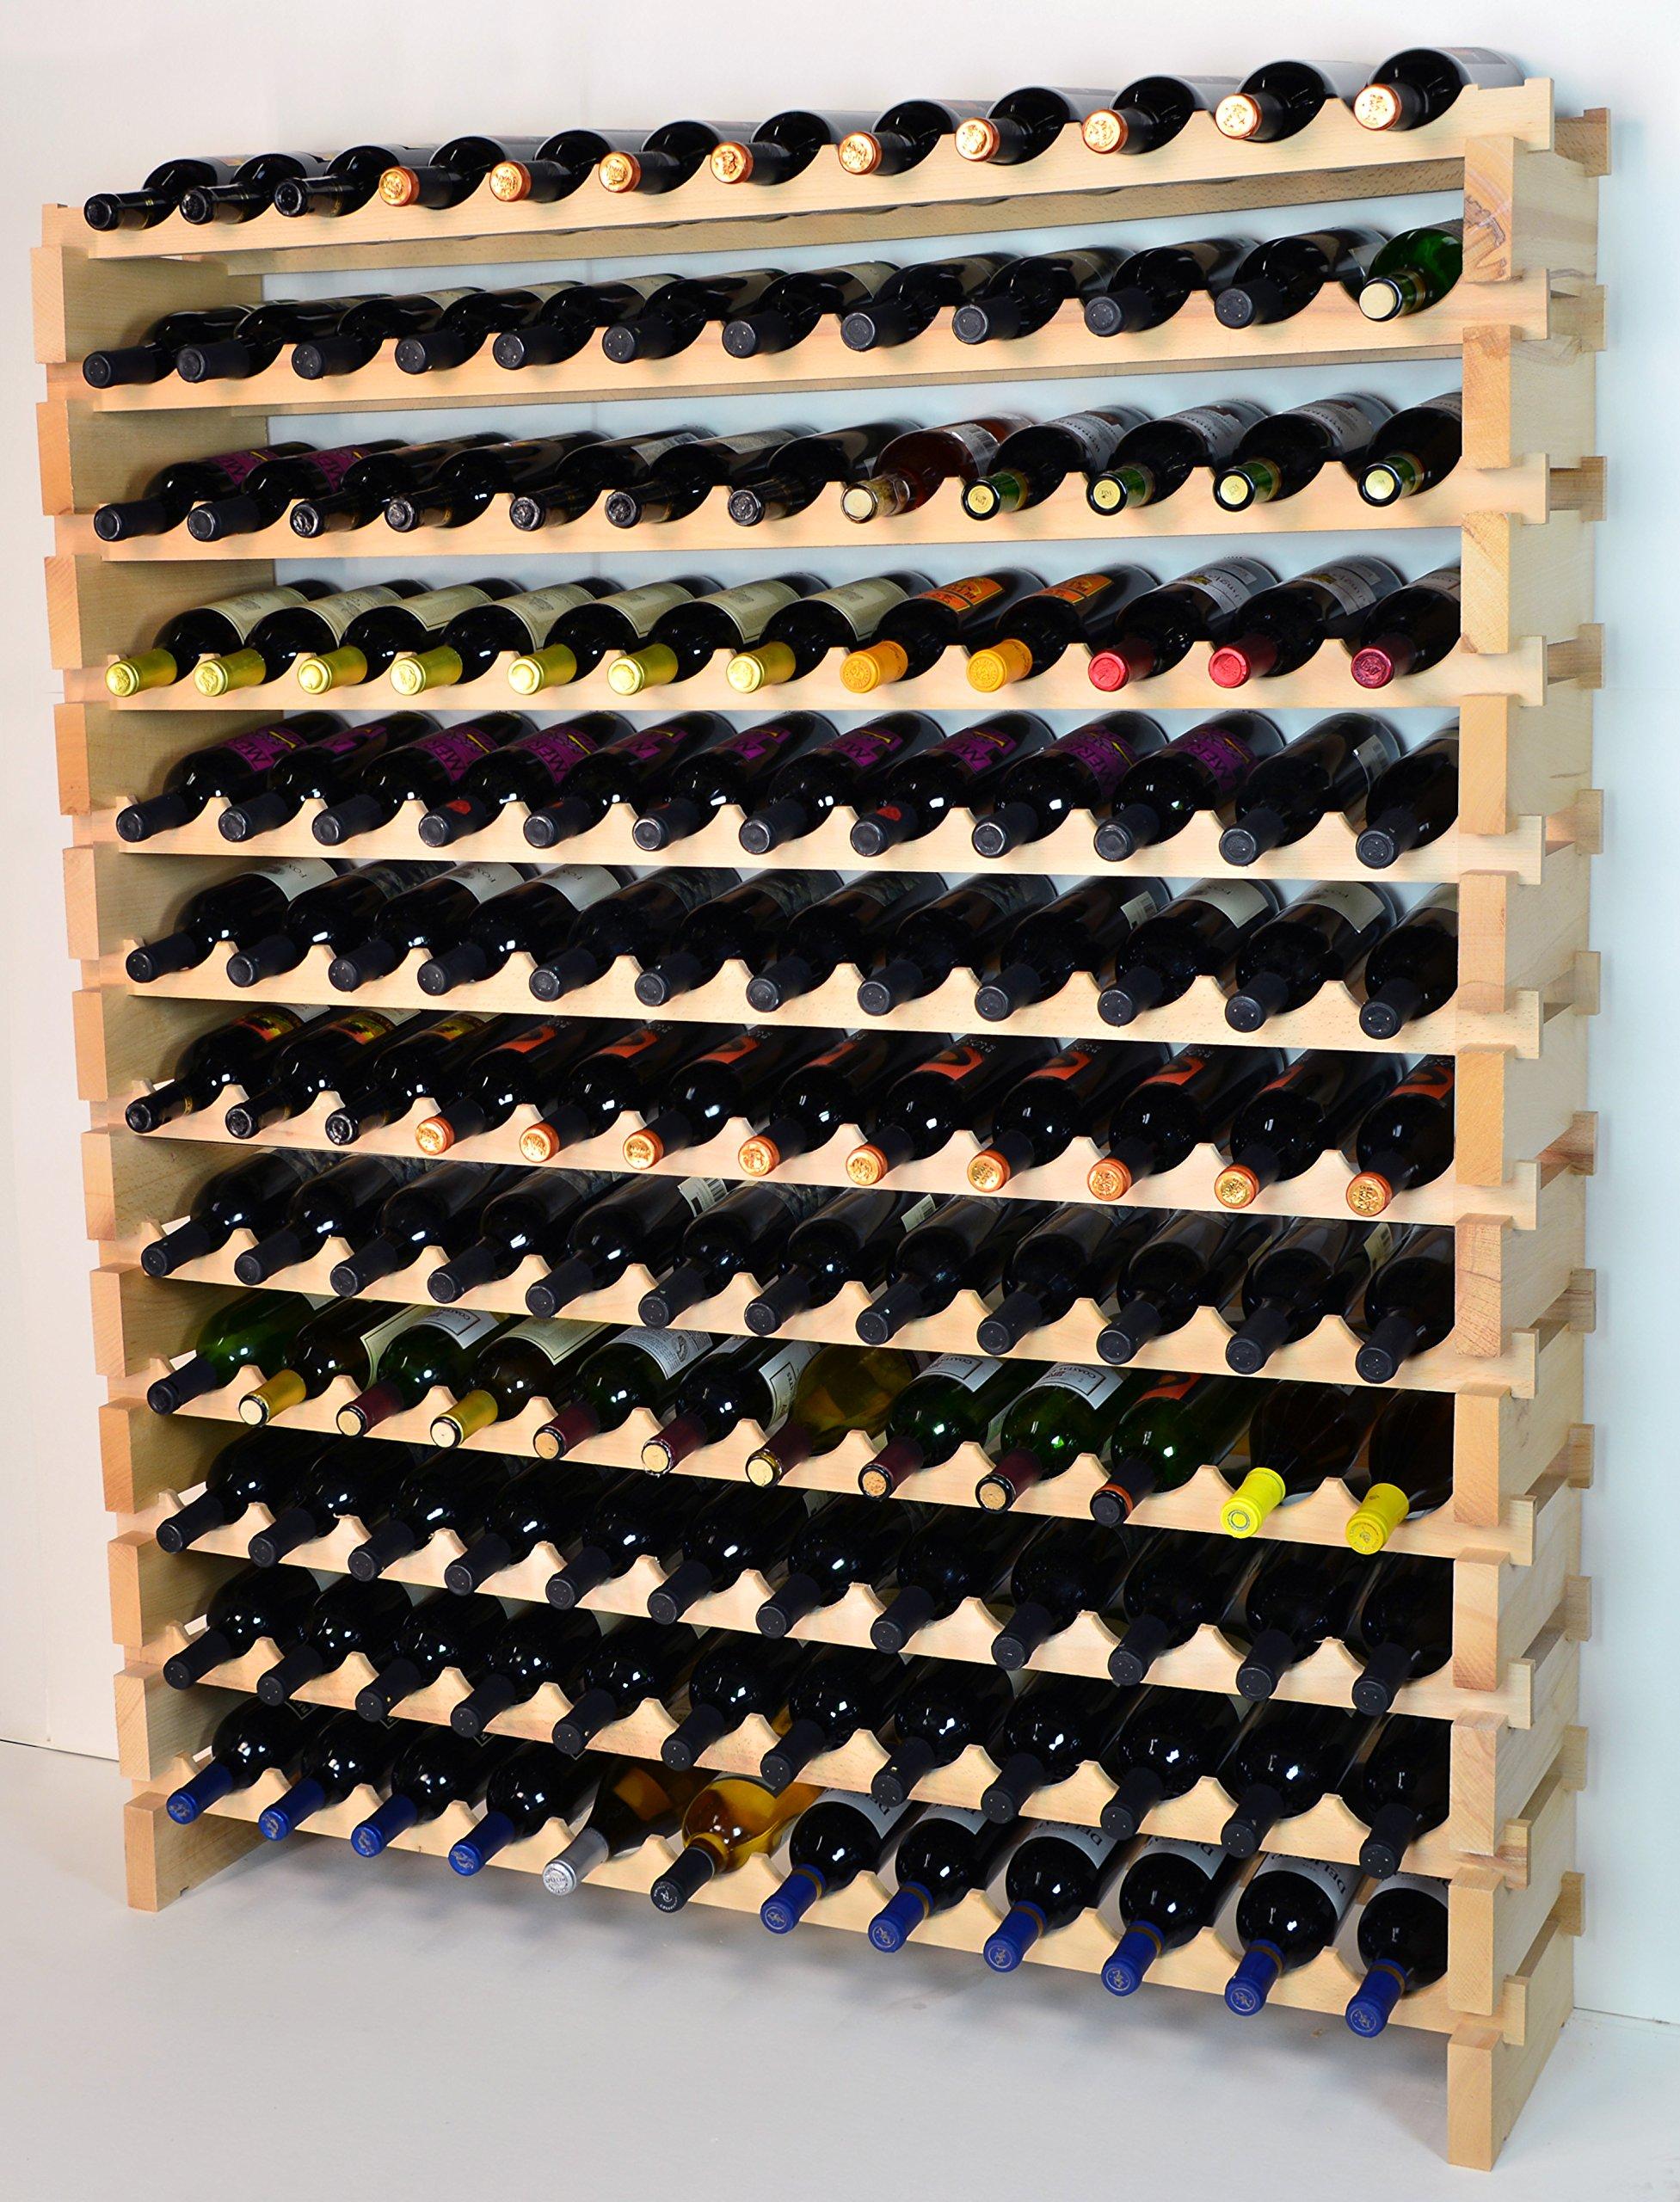 Modular Wine Rack Beechwood 48-144 Bottle Capacity 12 Bottles Across up to 12 Rows Newest Improved Model (144 Bottles - 12 Rows)